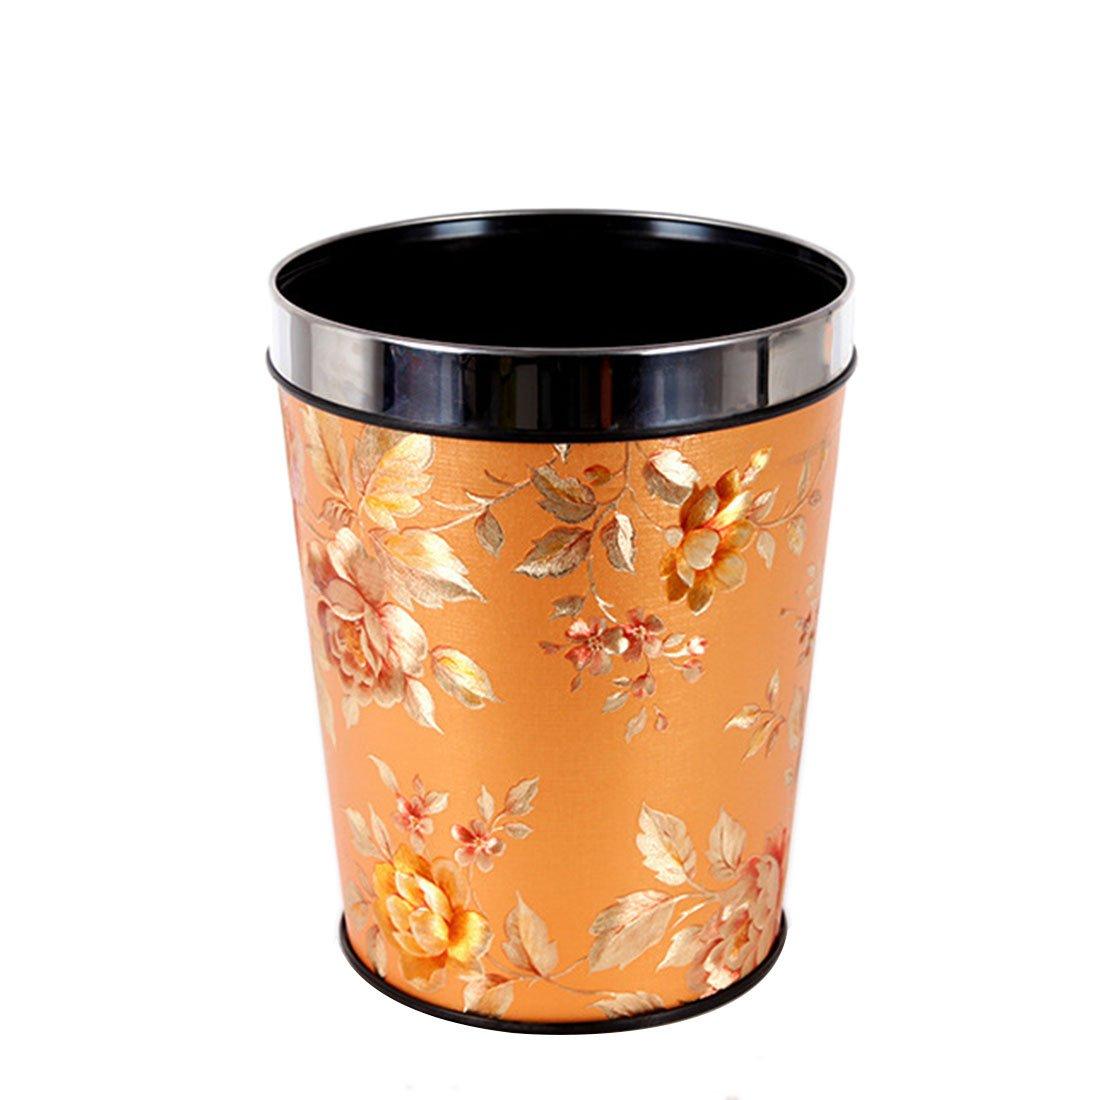 BBDI Trash Cans, PP Dustbin Garbage Bin Garbage Can Wastebasket without Lid, 12L - Golden Flowers Pattern